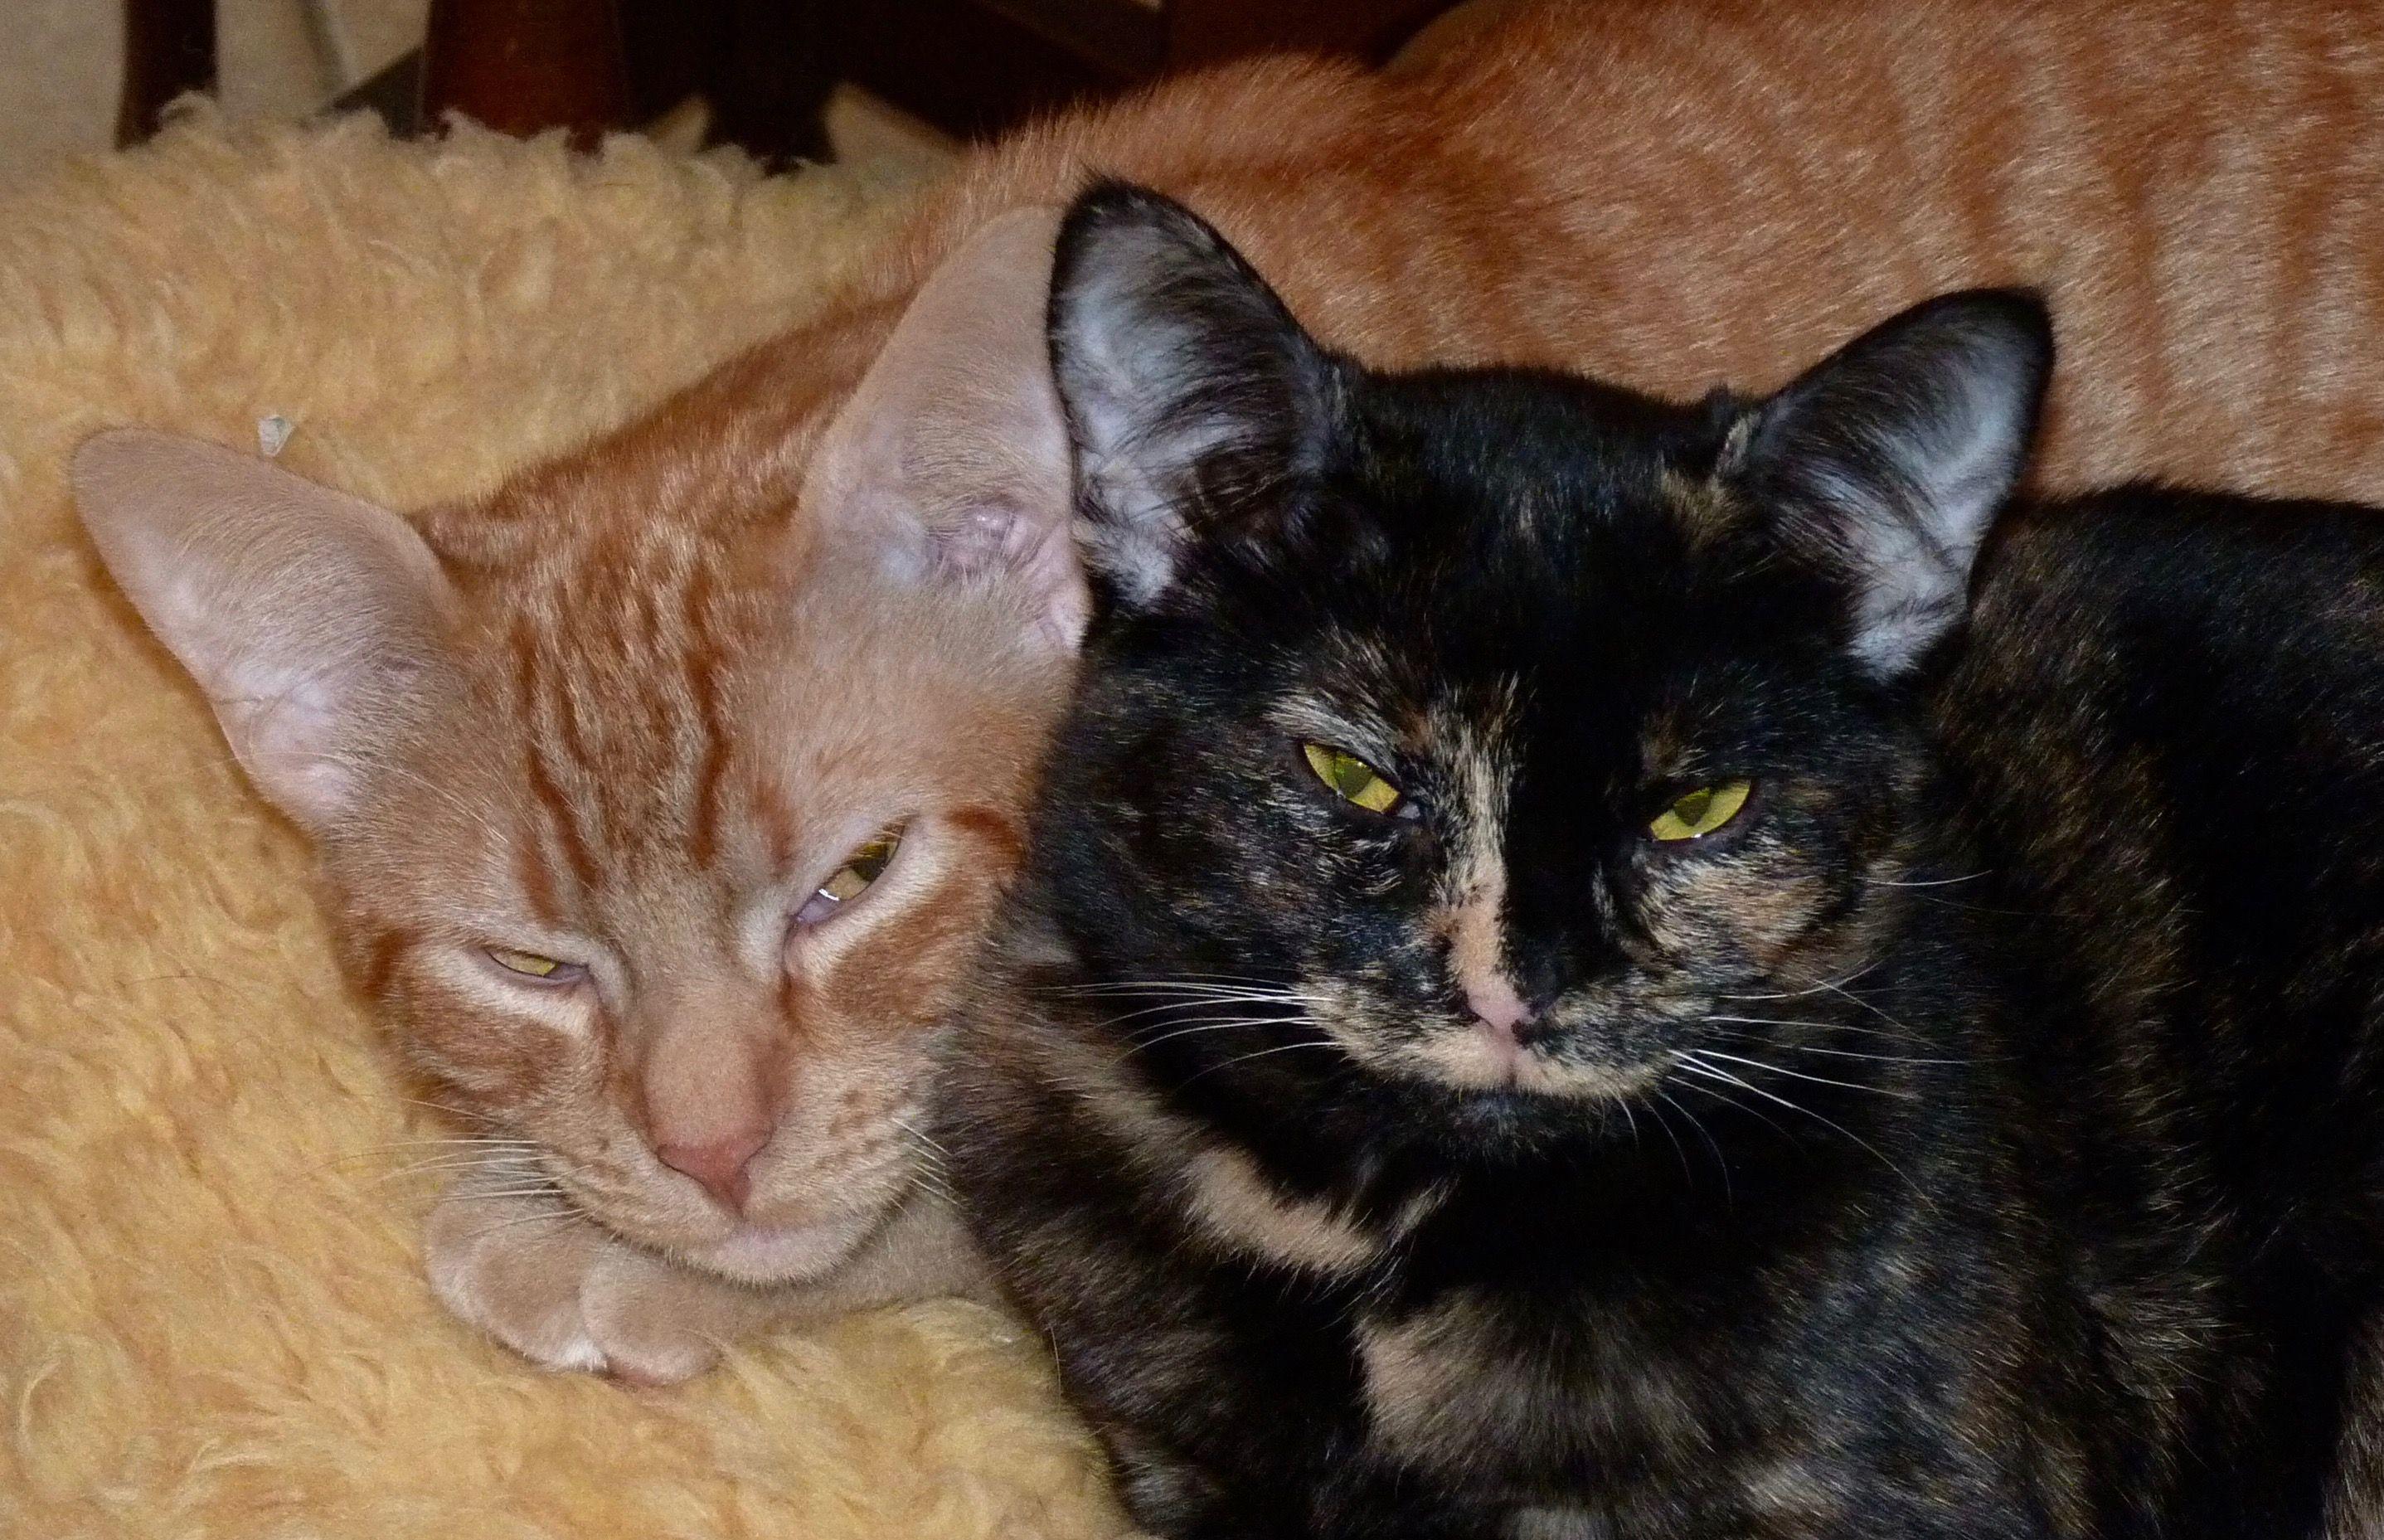 #kittens #eggsandbacon #cats #tired #drowsy #neocurio #artatak